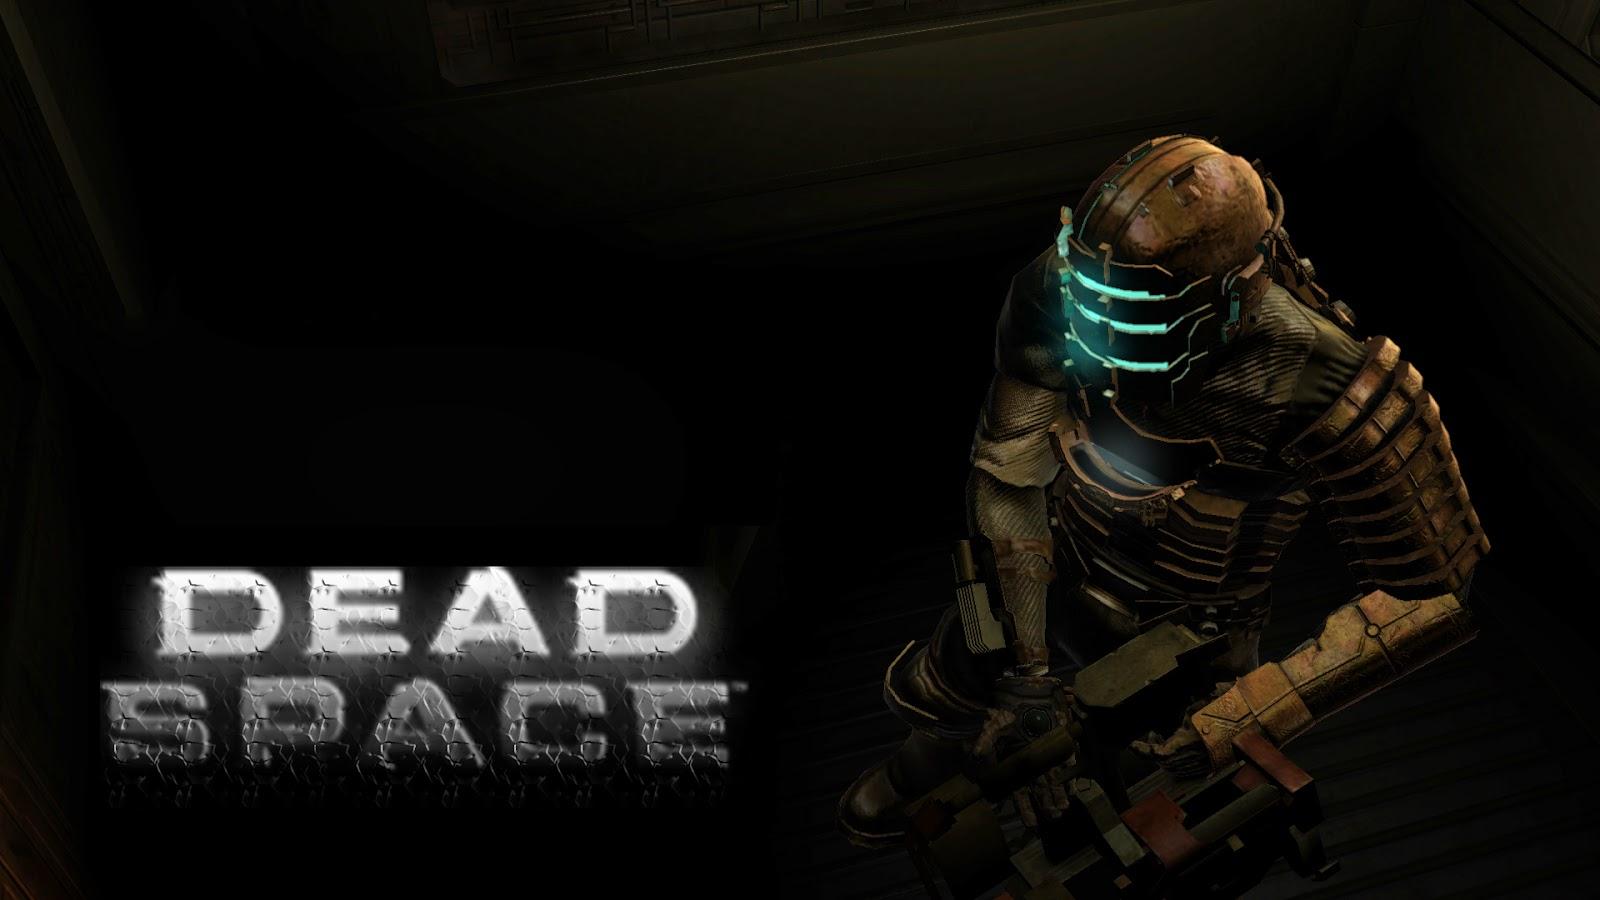 best Dead Space images on Pinterest